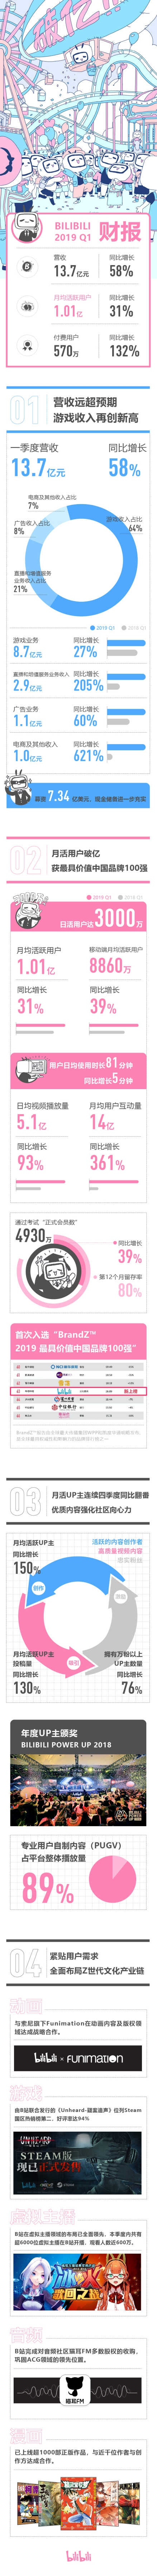 B站发布2019年Q1财报:营收13.7亿元 月活跃用户首度破亿